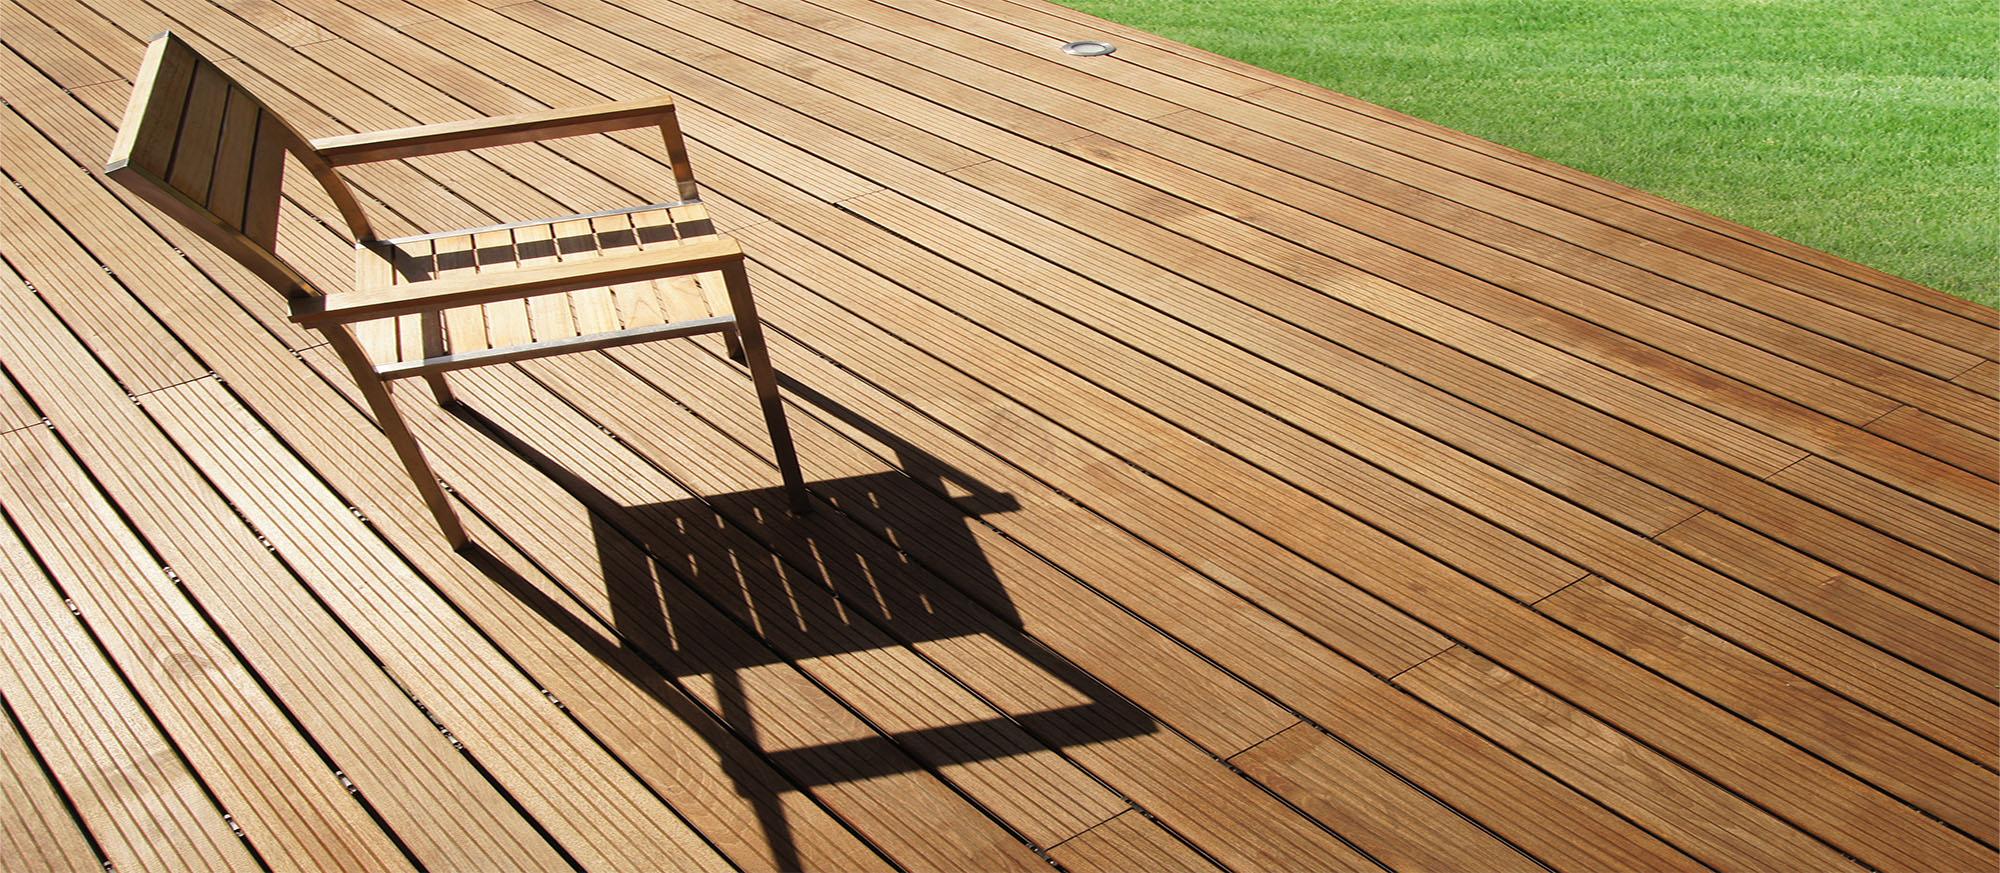 terrasse mobil home du soleil terrasses bois mobil homes et accessoire. Black Bedroom Furniture Sets. Home Design Ideas